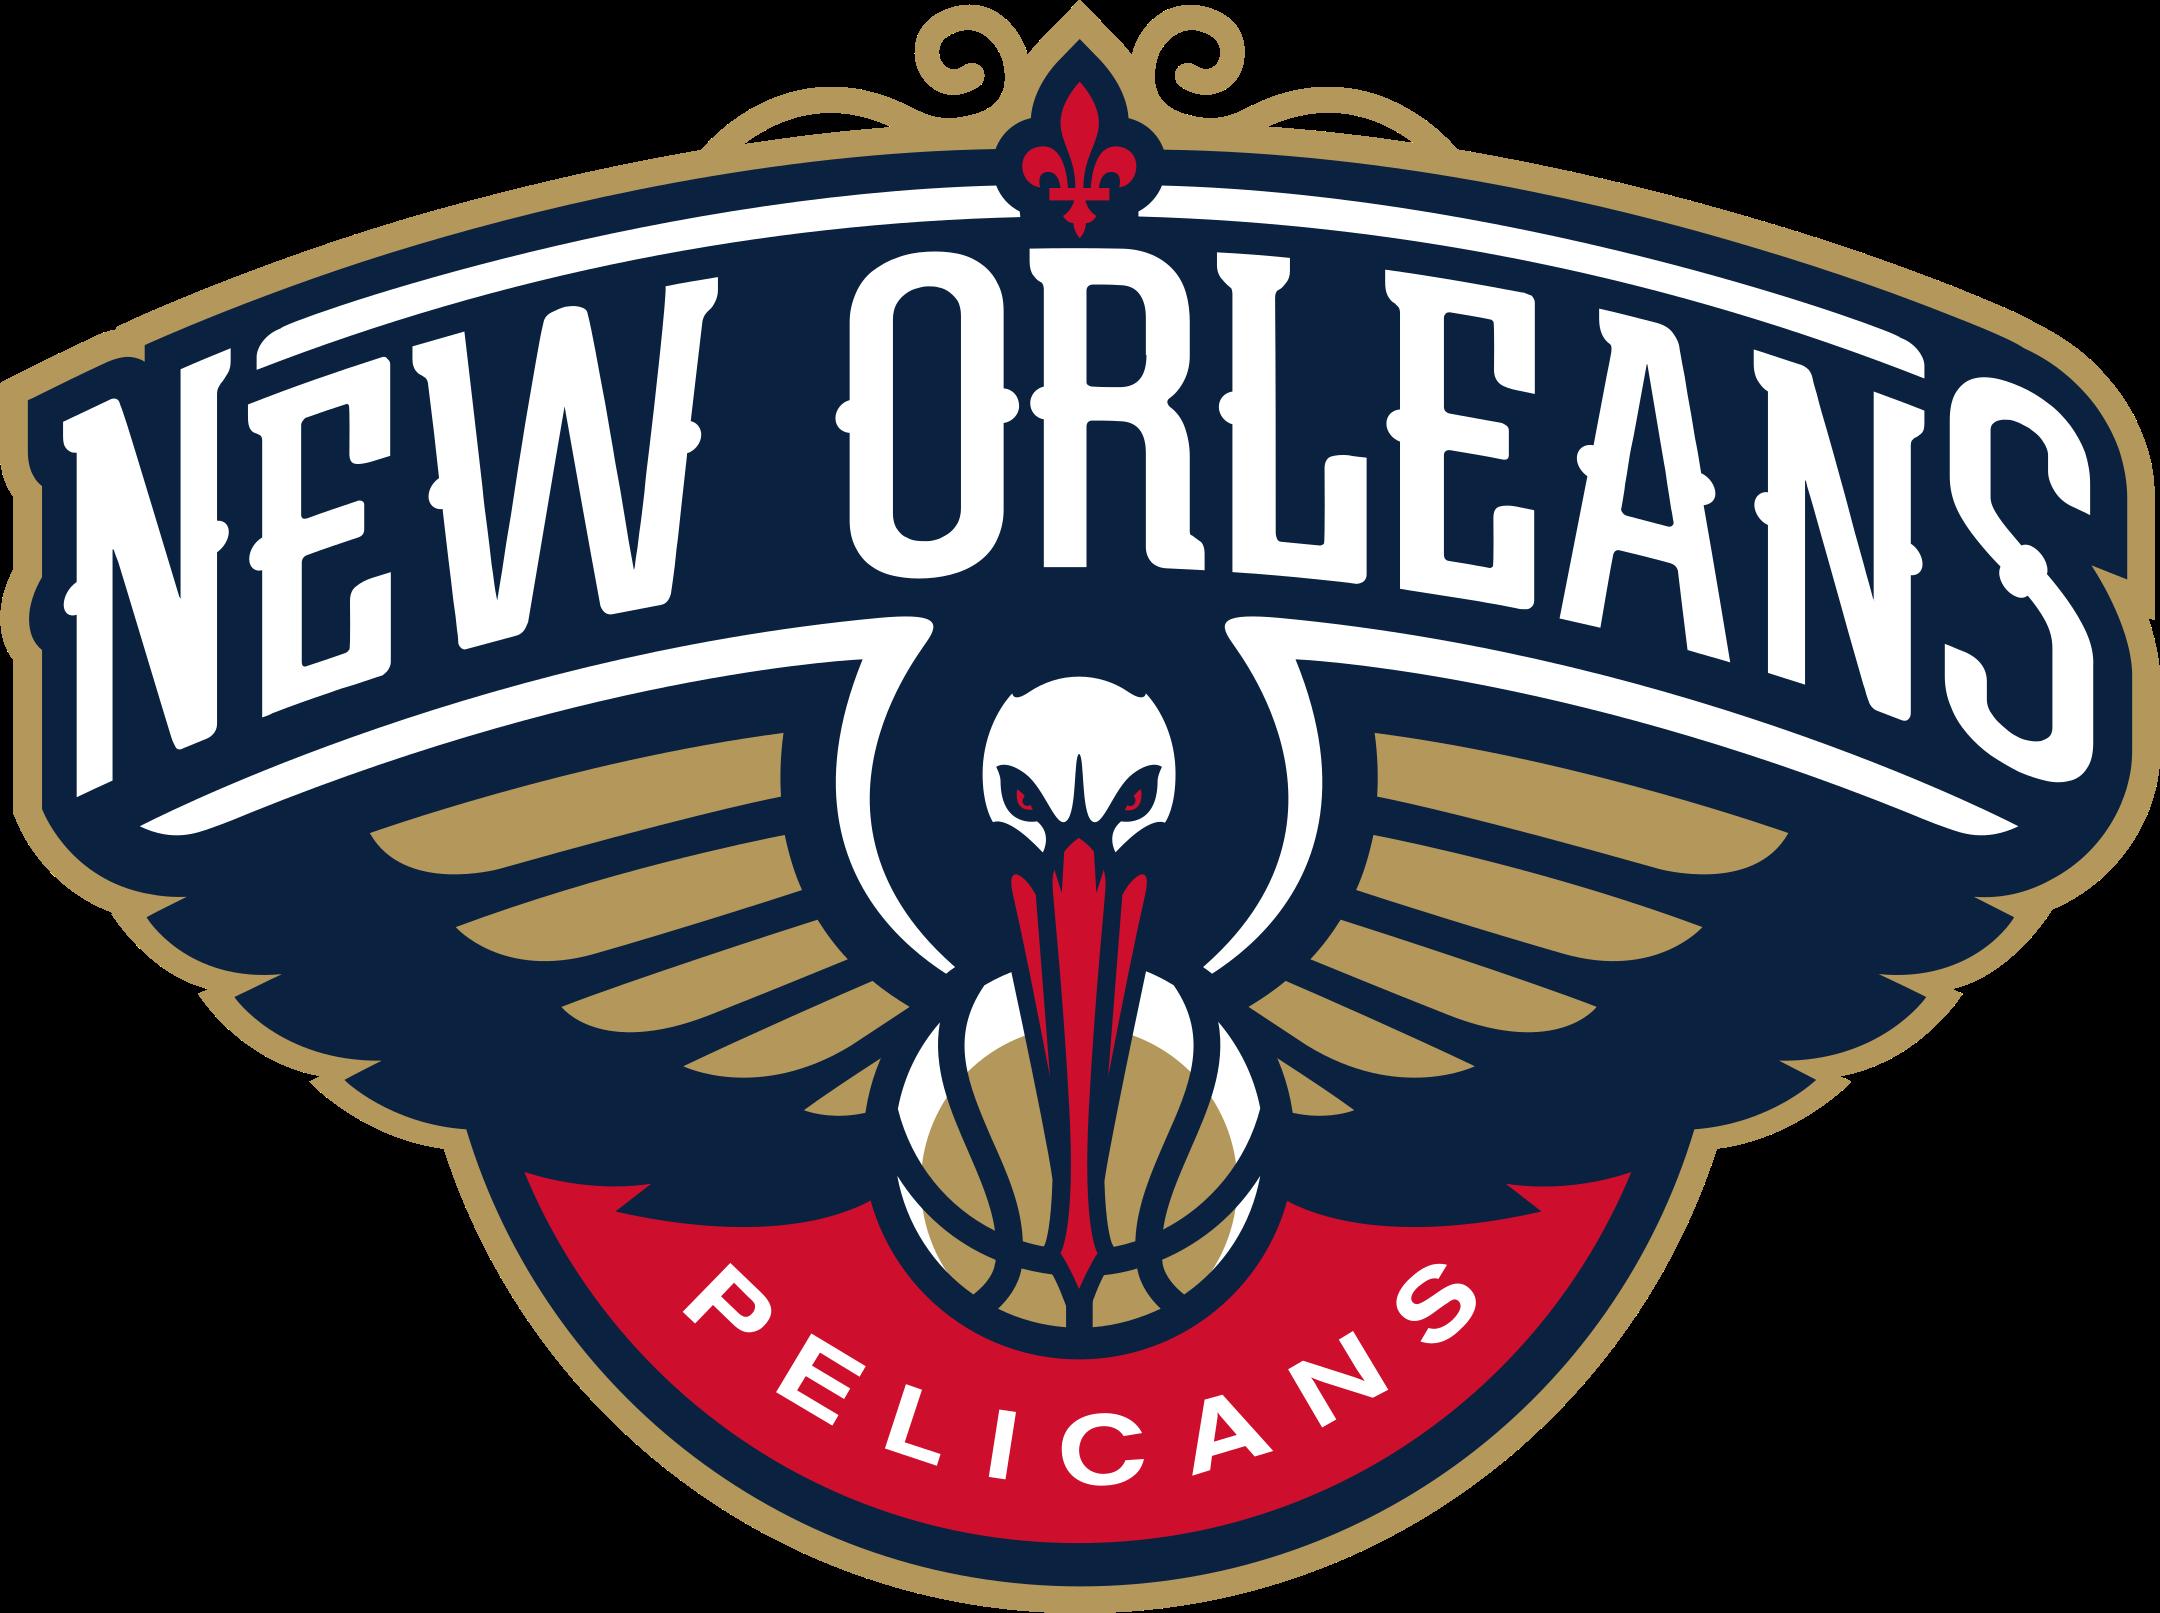 new orleans pelicans logo 1 - New Orleans Pelicans Logo